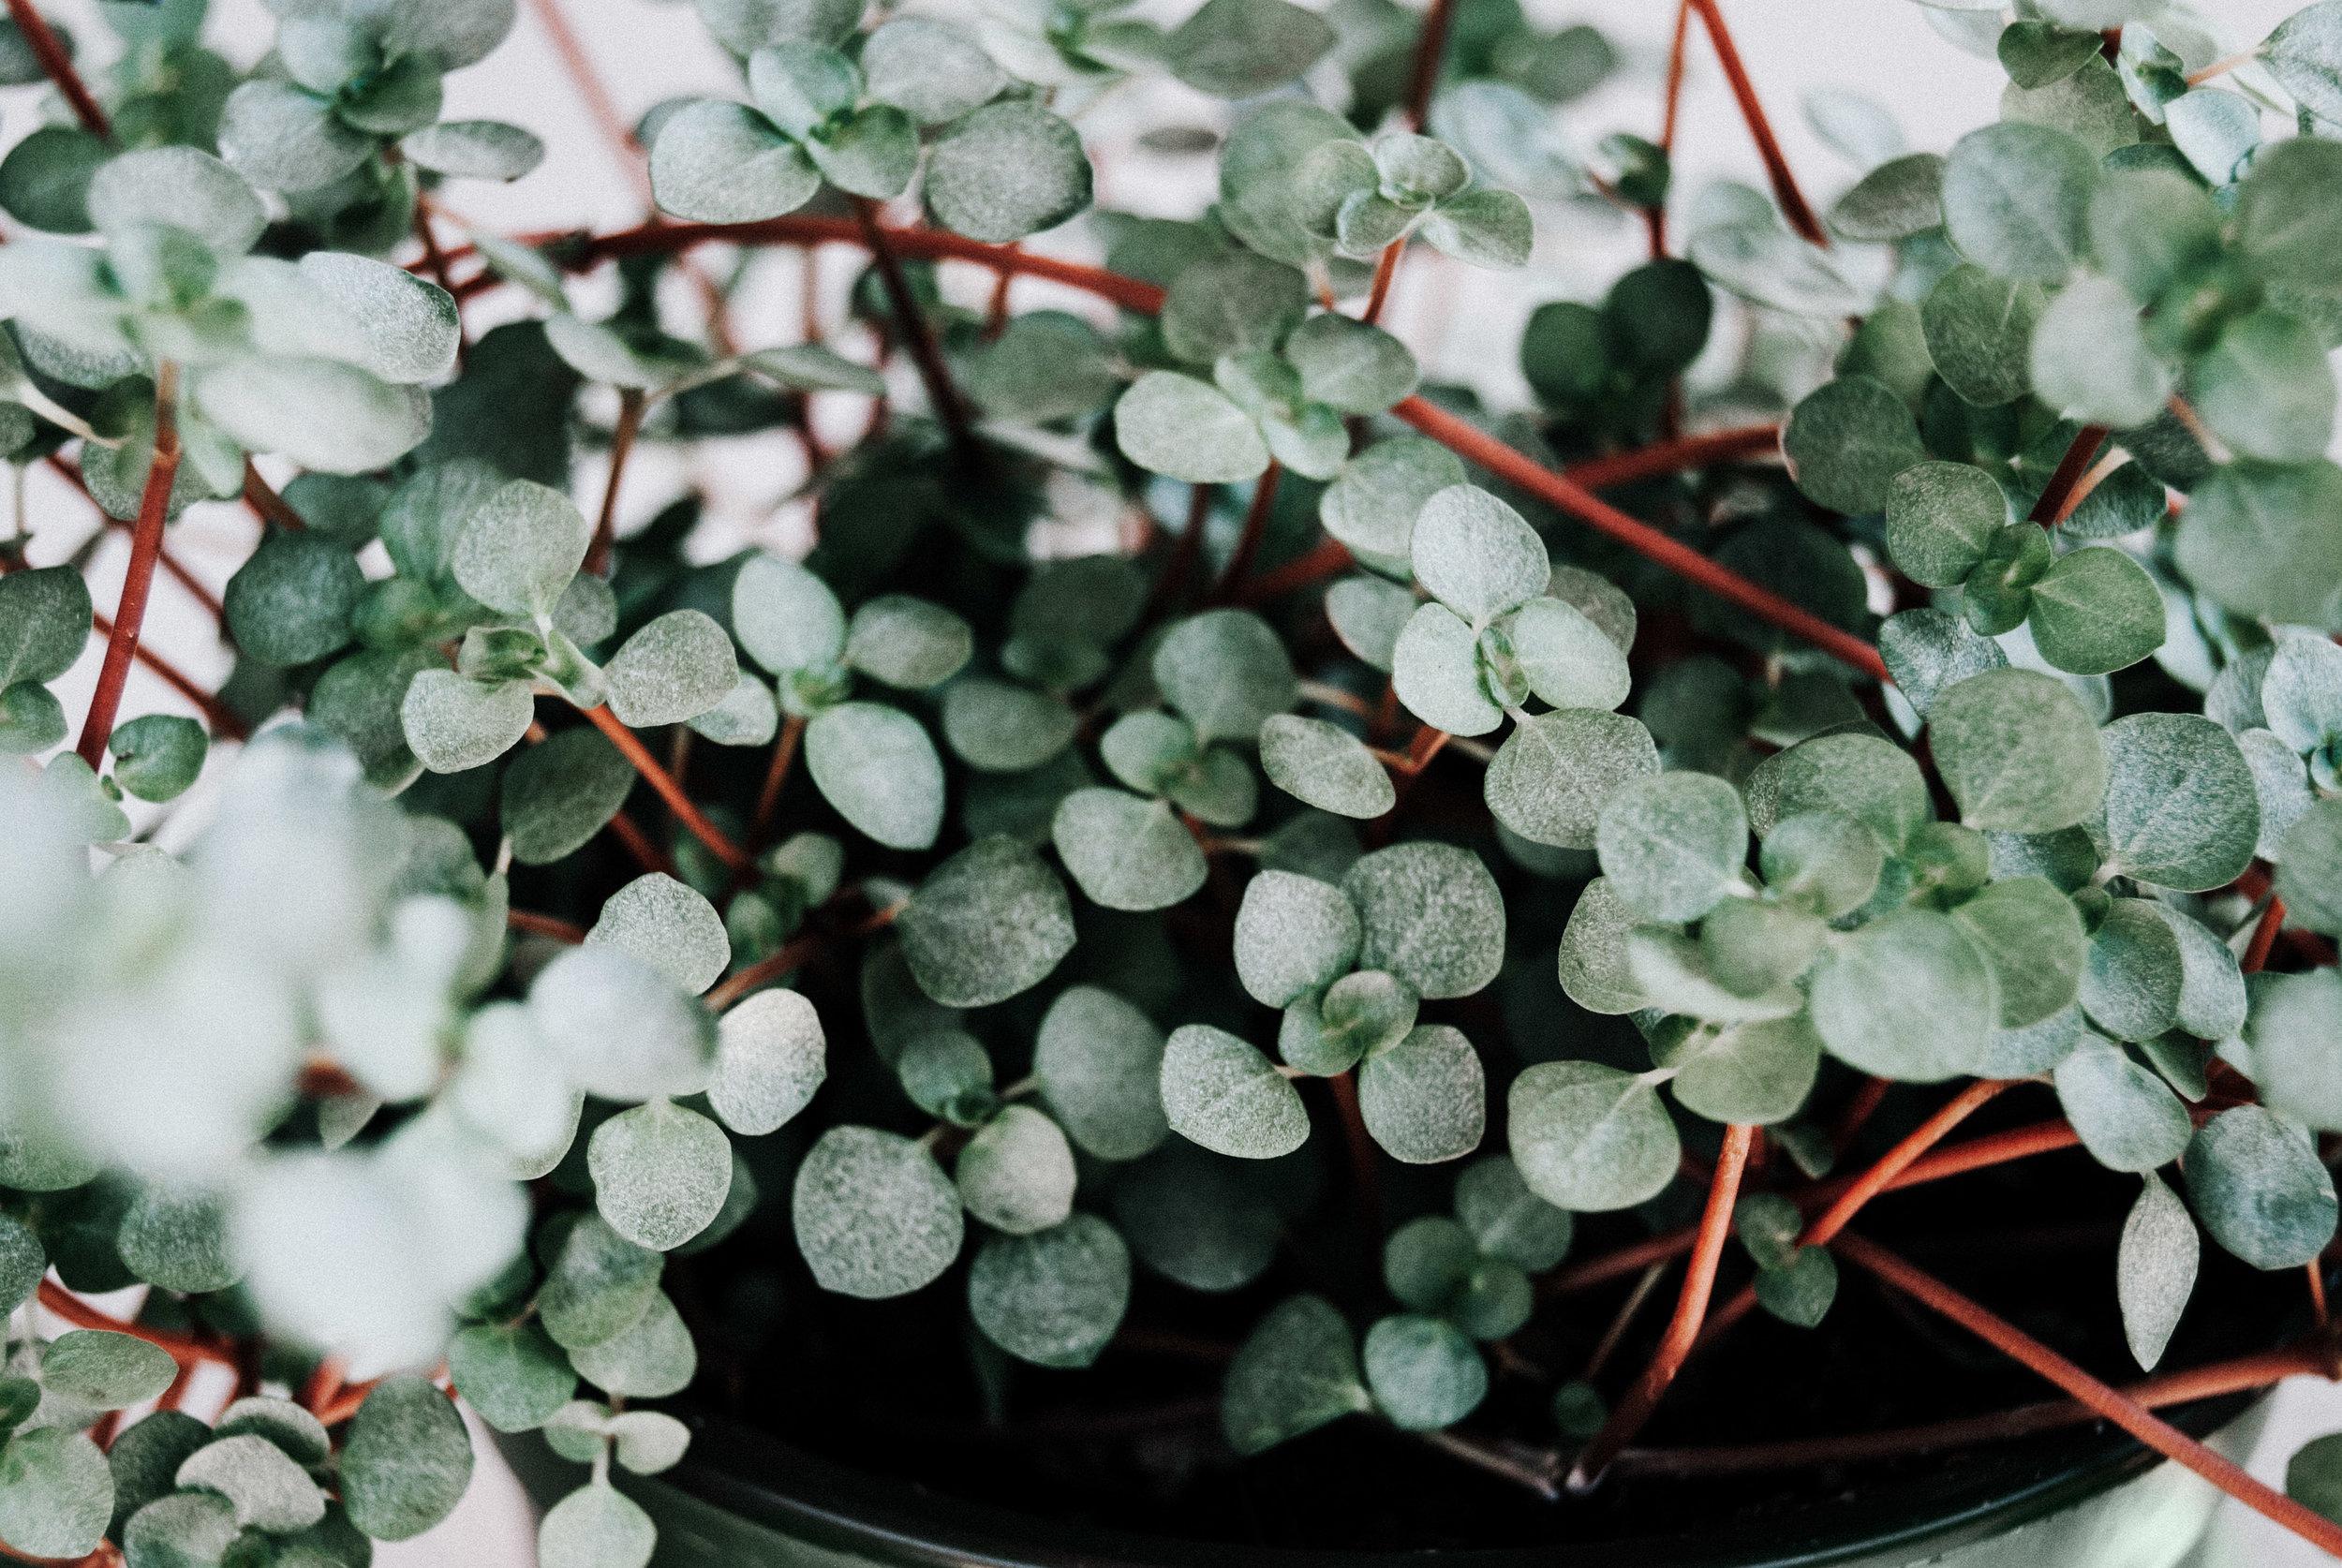 Silver sparkle pilea Houseplant Care Guide - Dusty Hegge